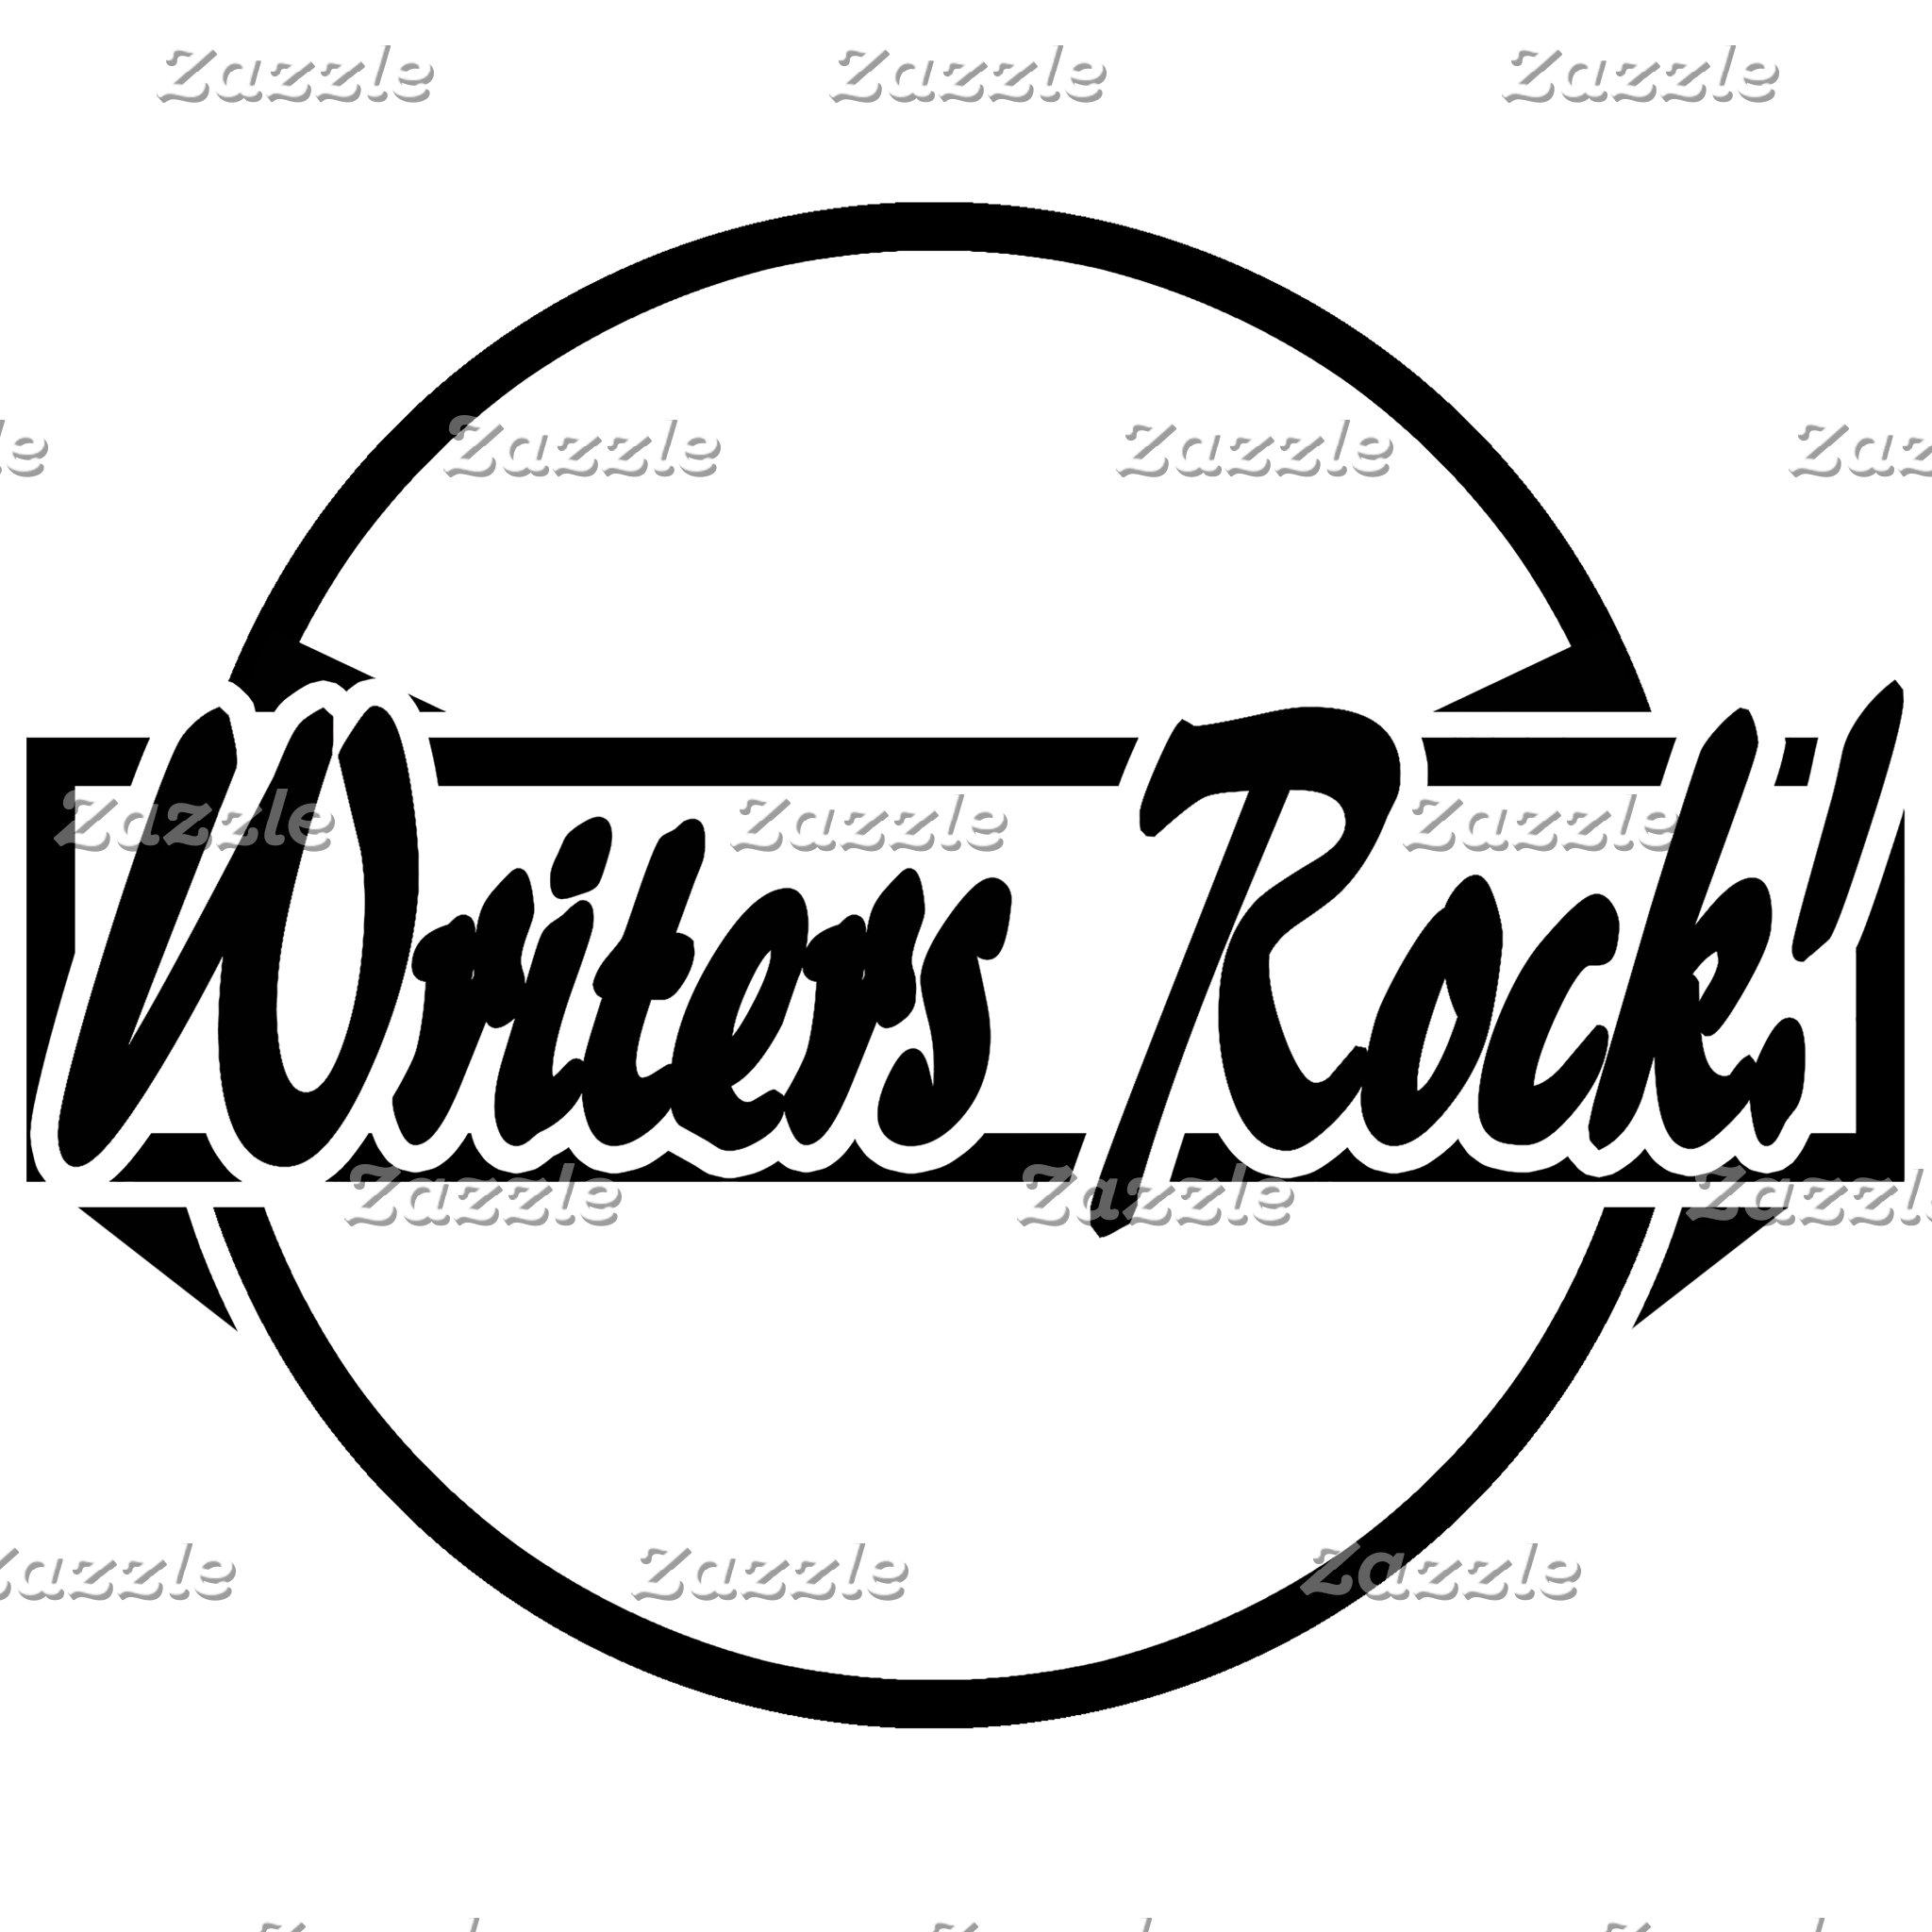 Writers Rock!